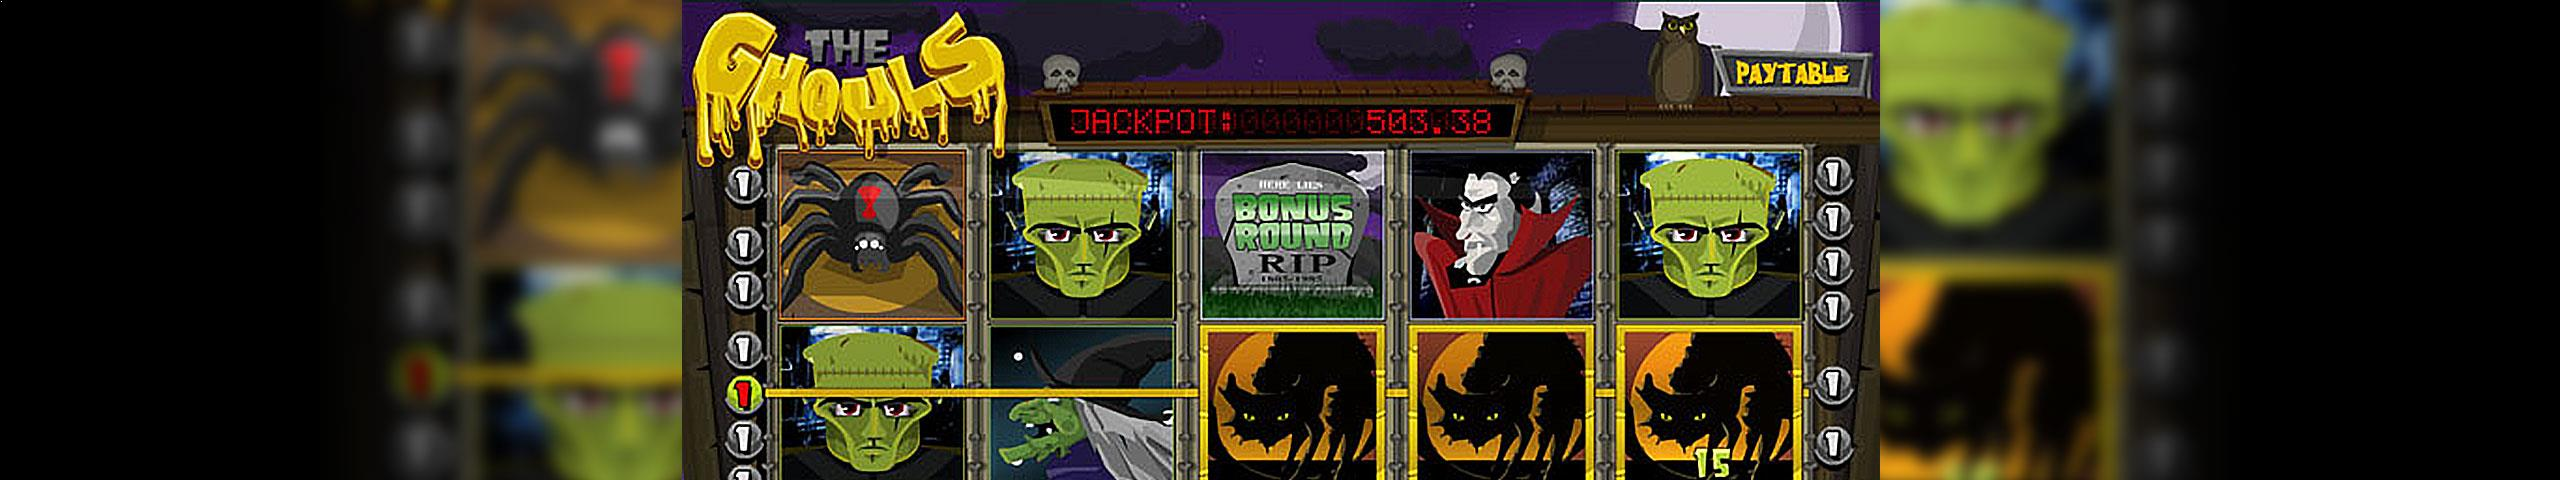 The Ghouls Mini Betsoft jocuri slot slider